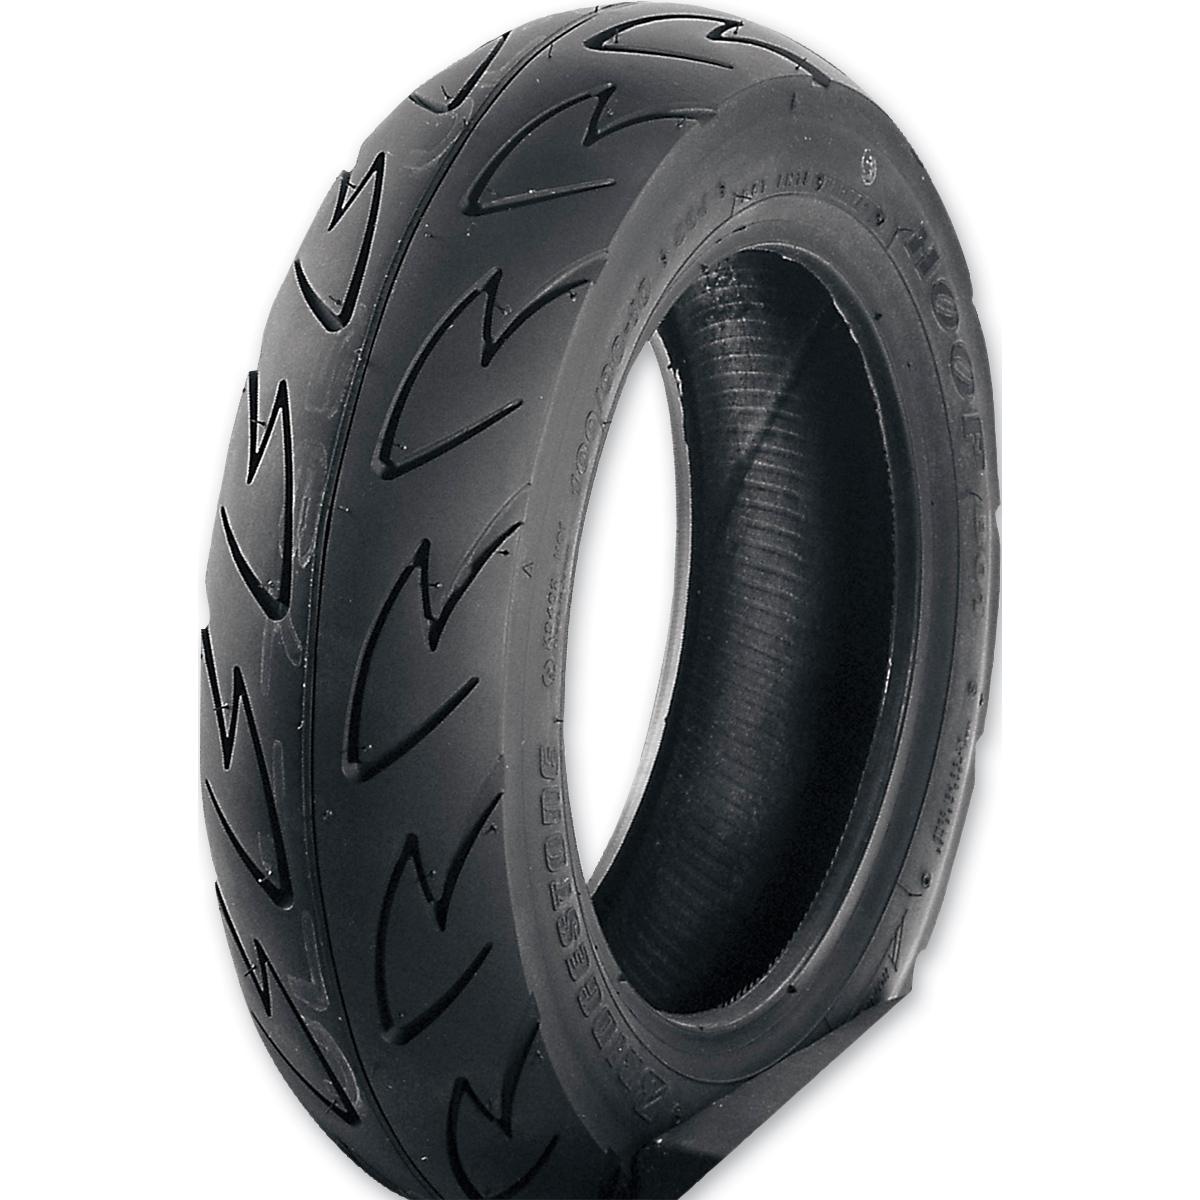 Bridgestone BT TH01R-M 160/60R14 Rear Tire